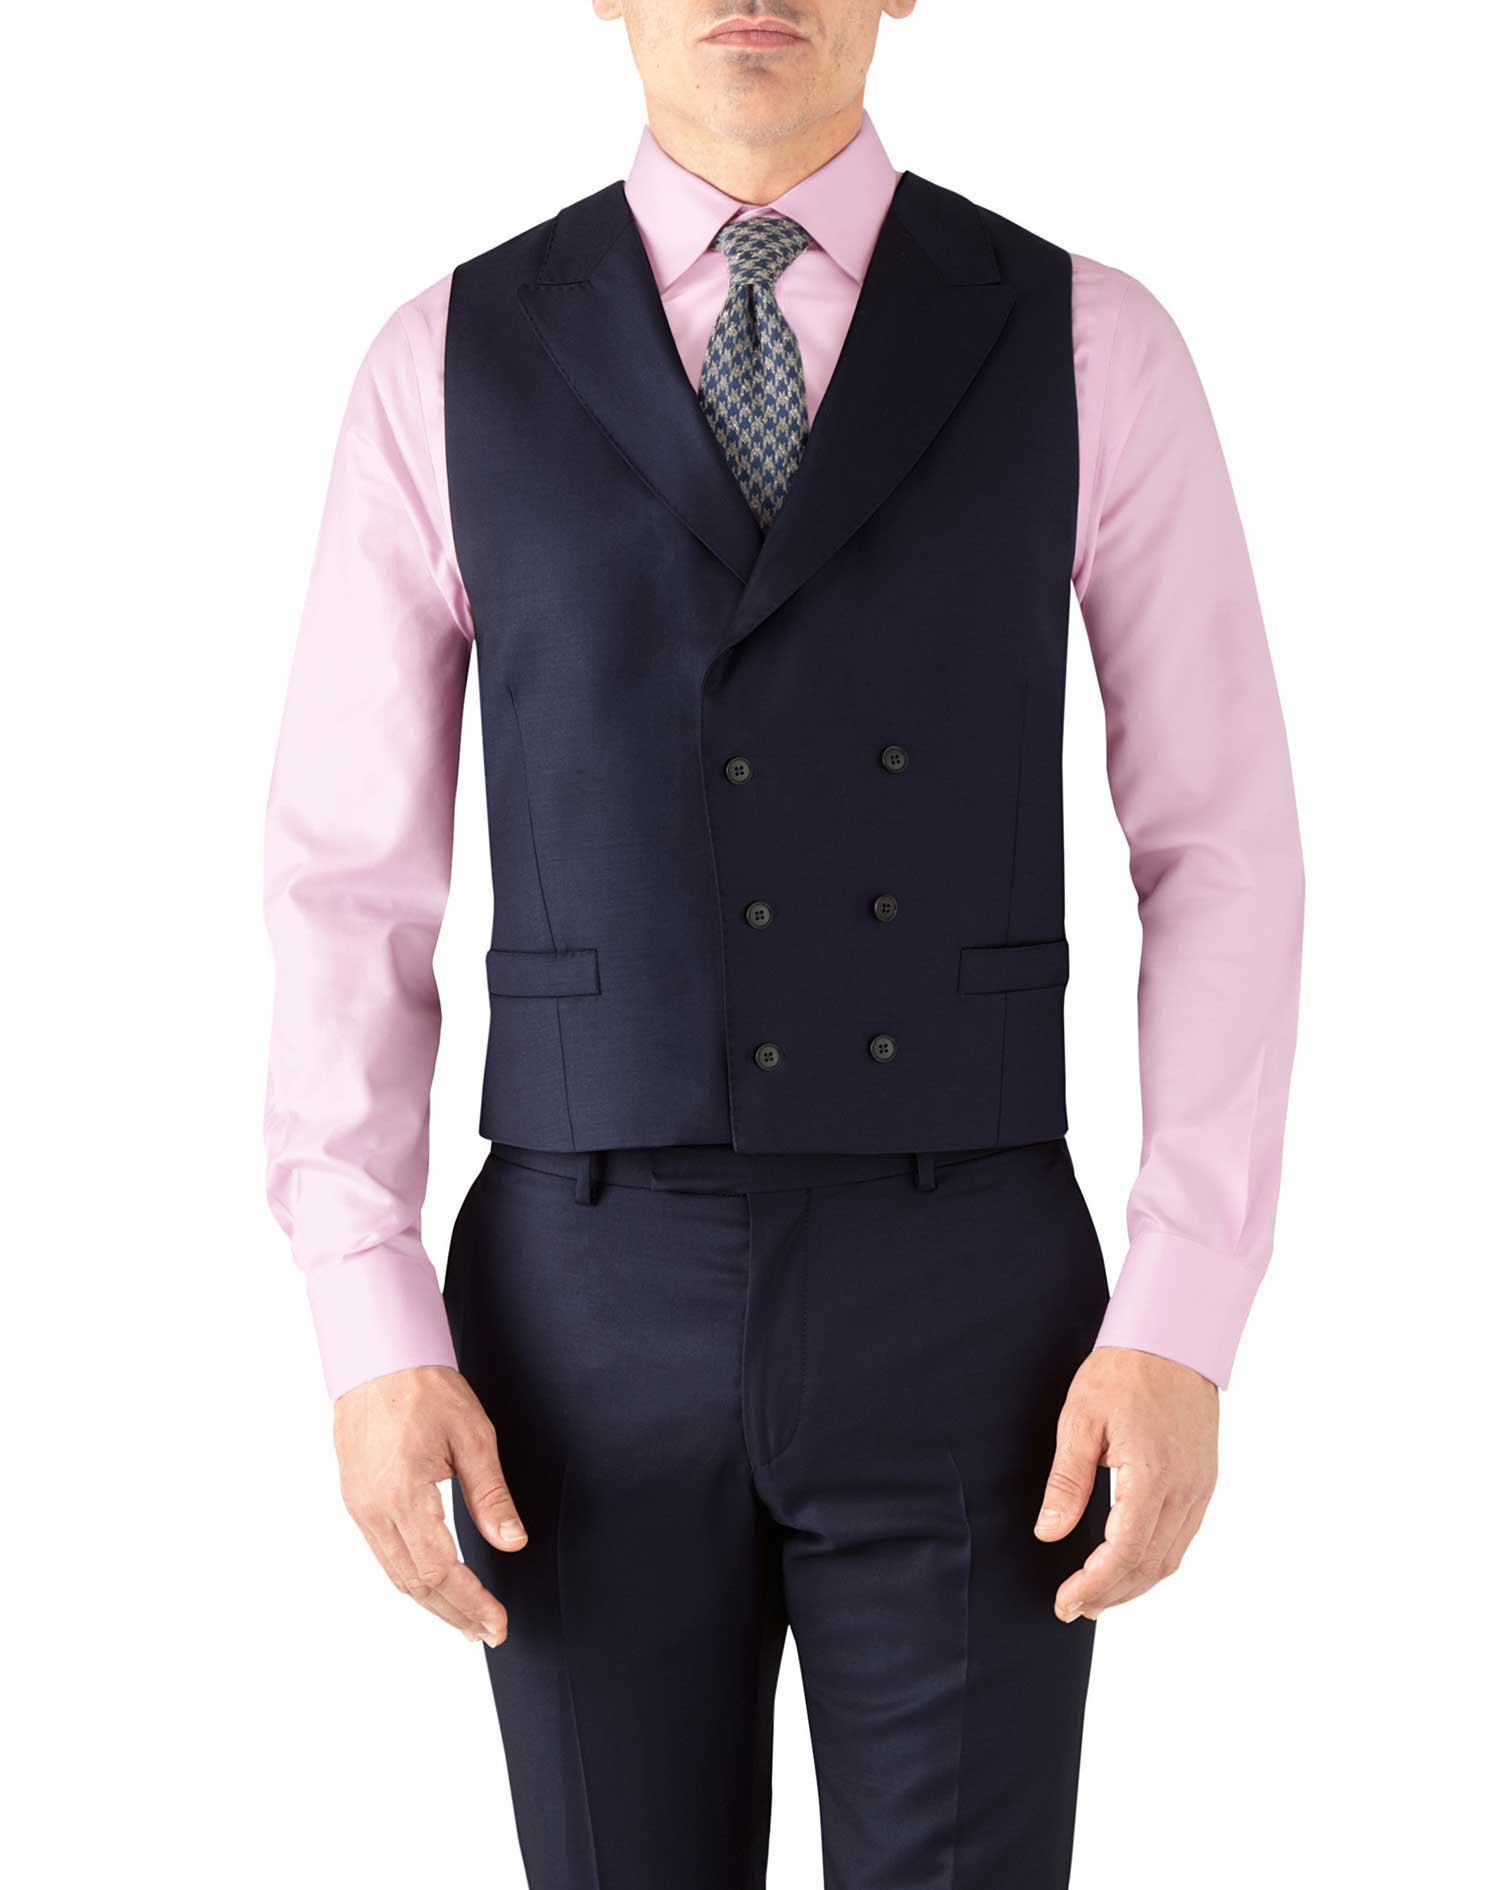 Navy Adjustable Fit Italian Twill Luxury Suit Wool Waistcoat Size w44 by Charles Tyrwhitt